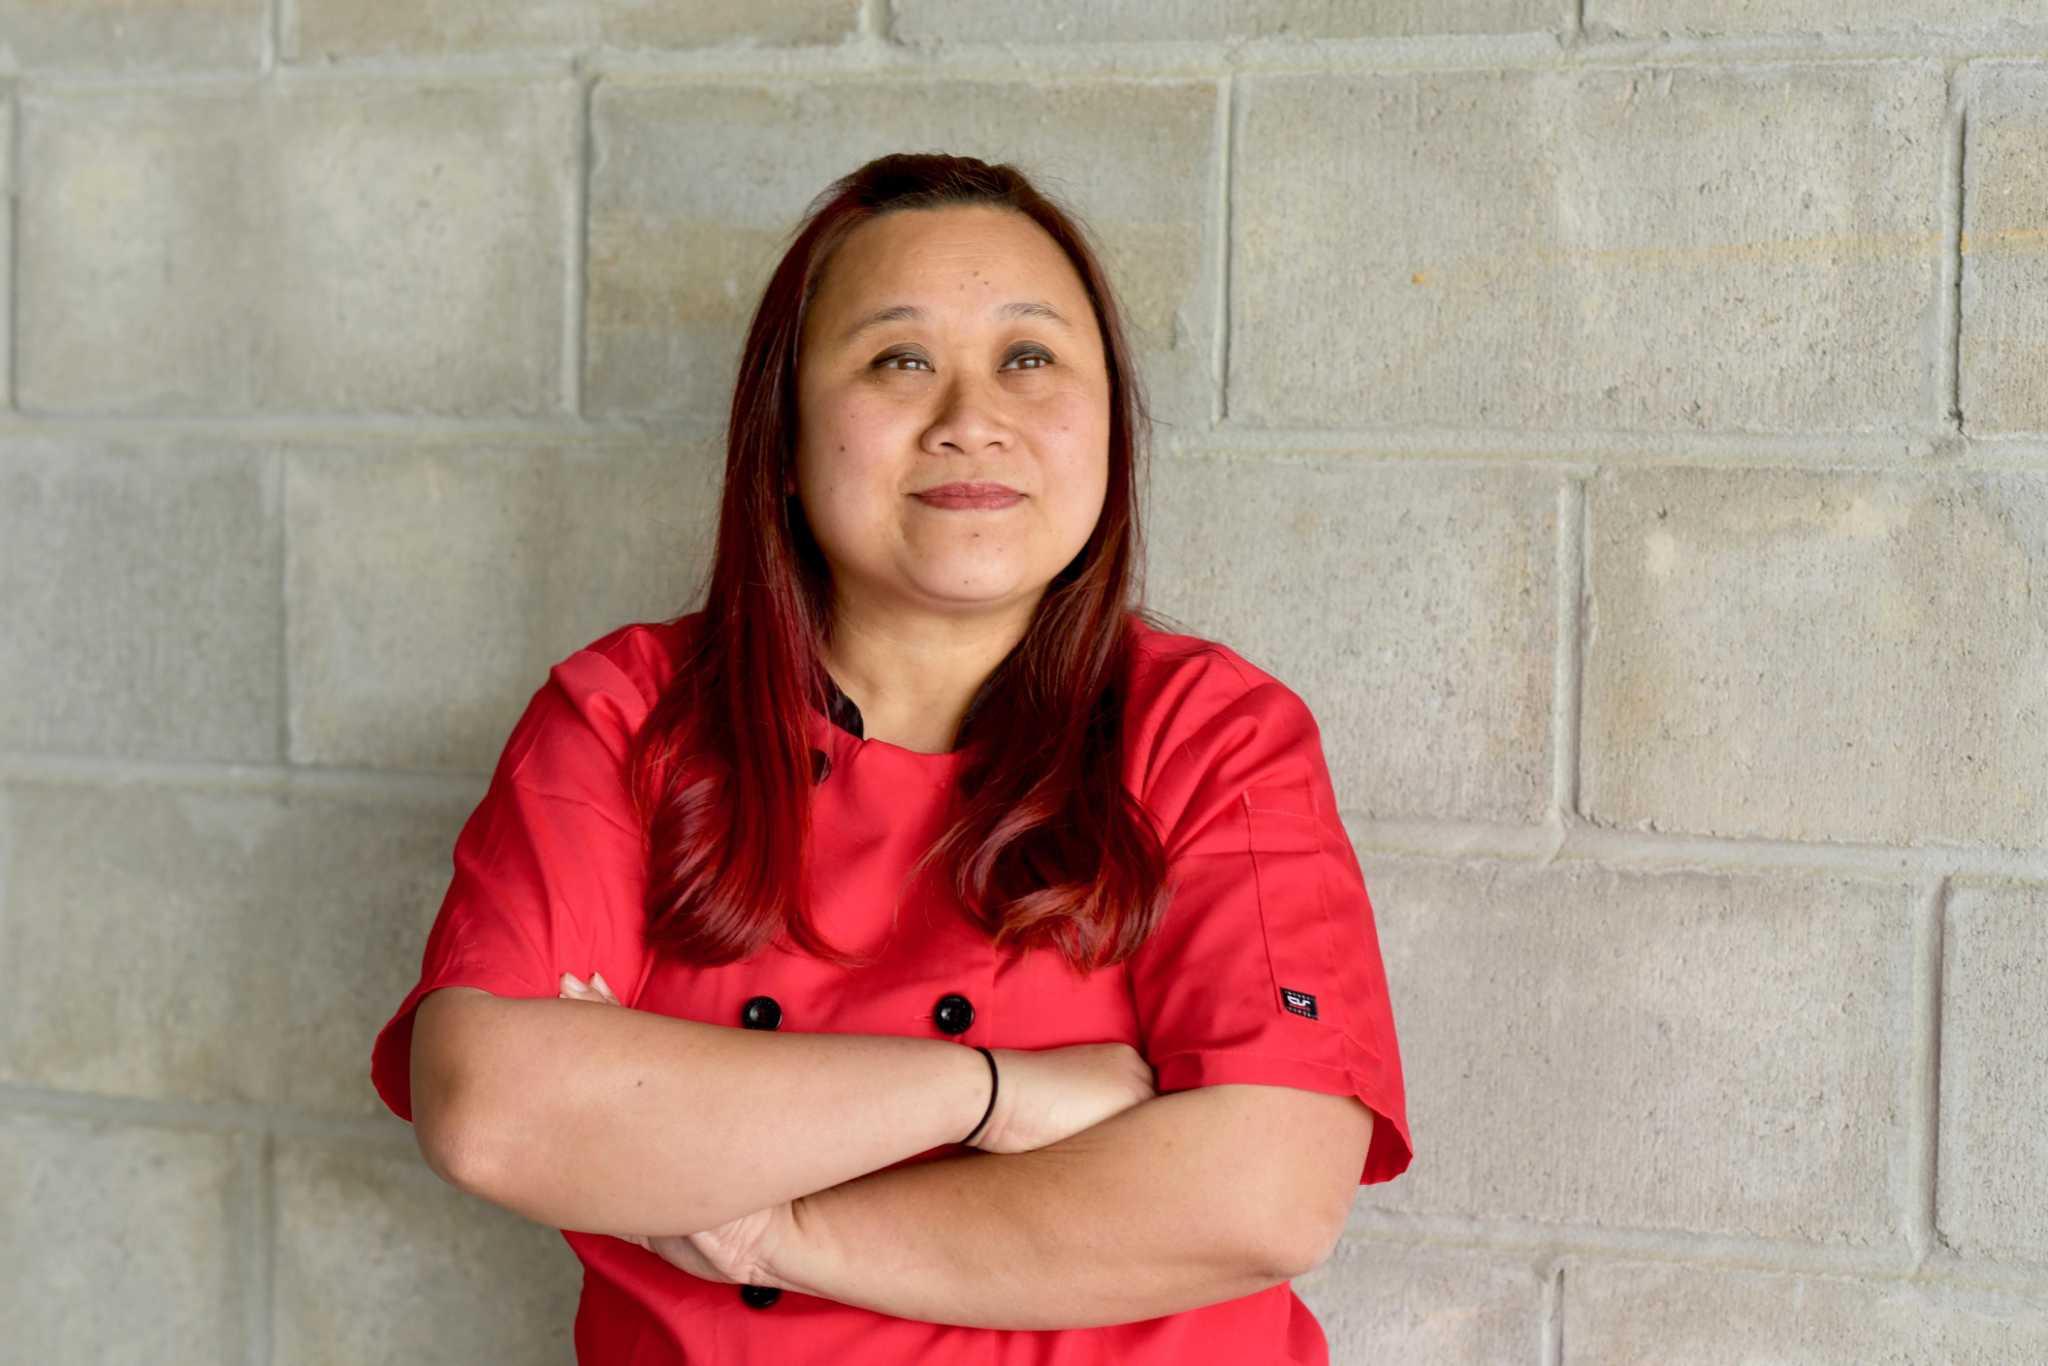 www.houstonchronicle.com: Meet Houston's top women chefs of color